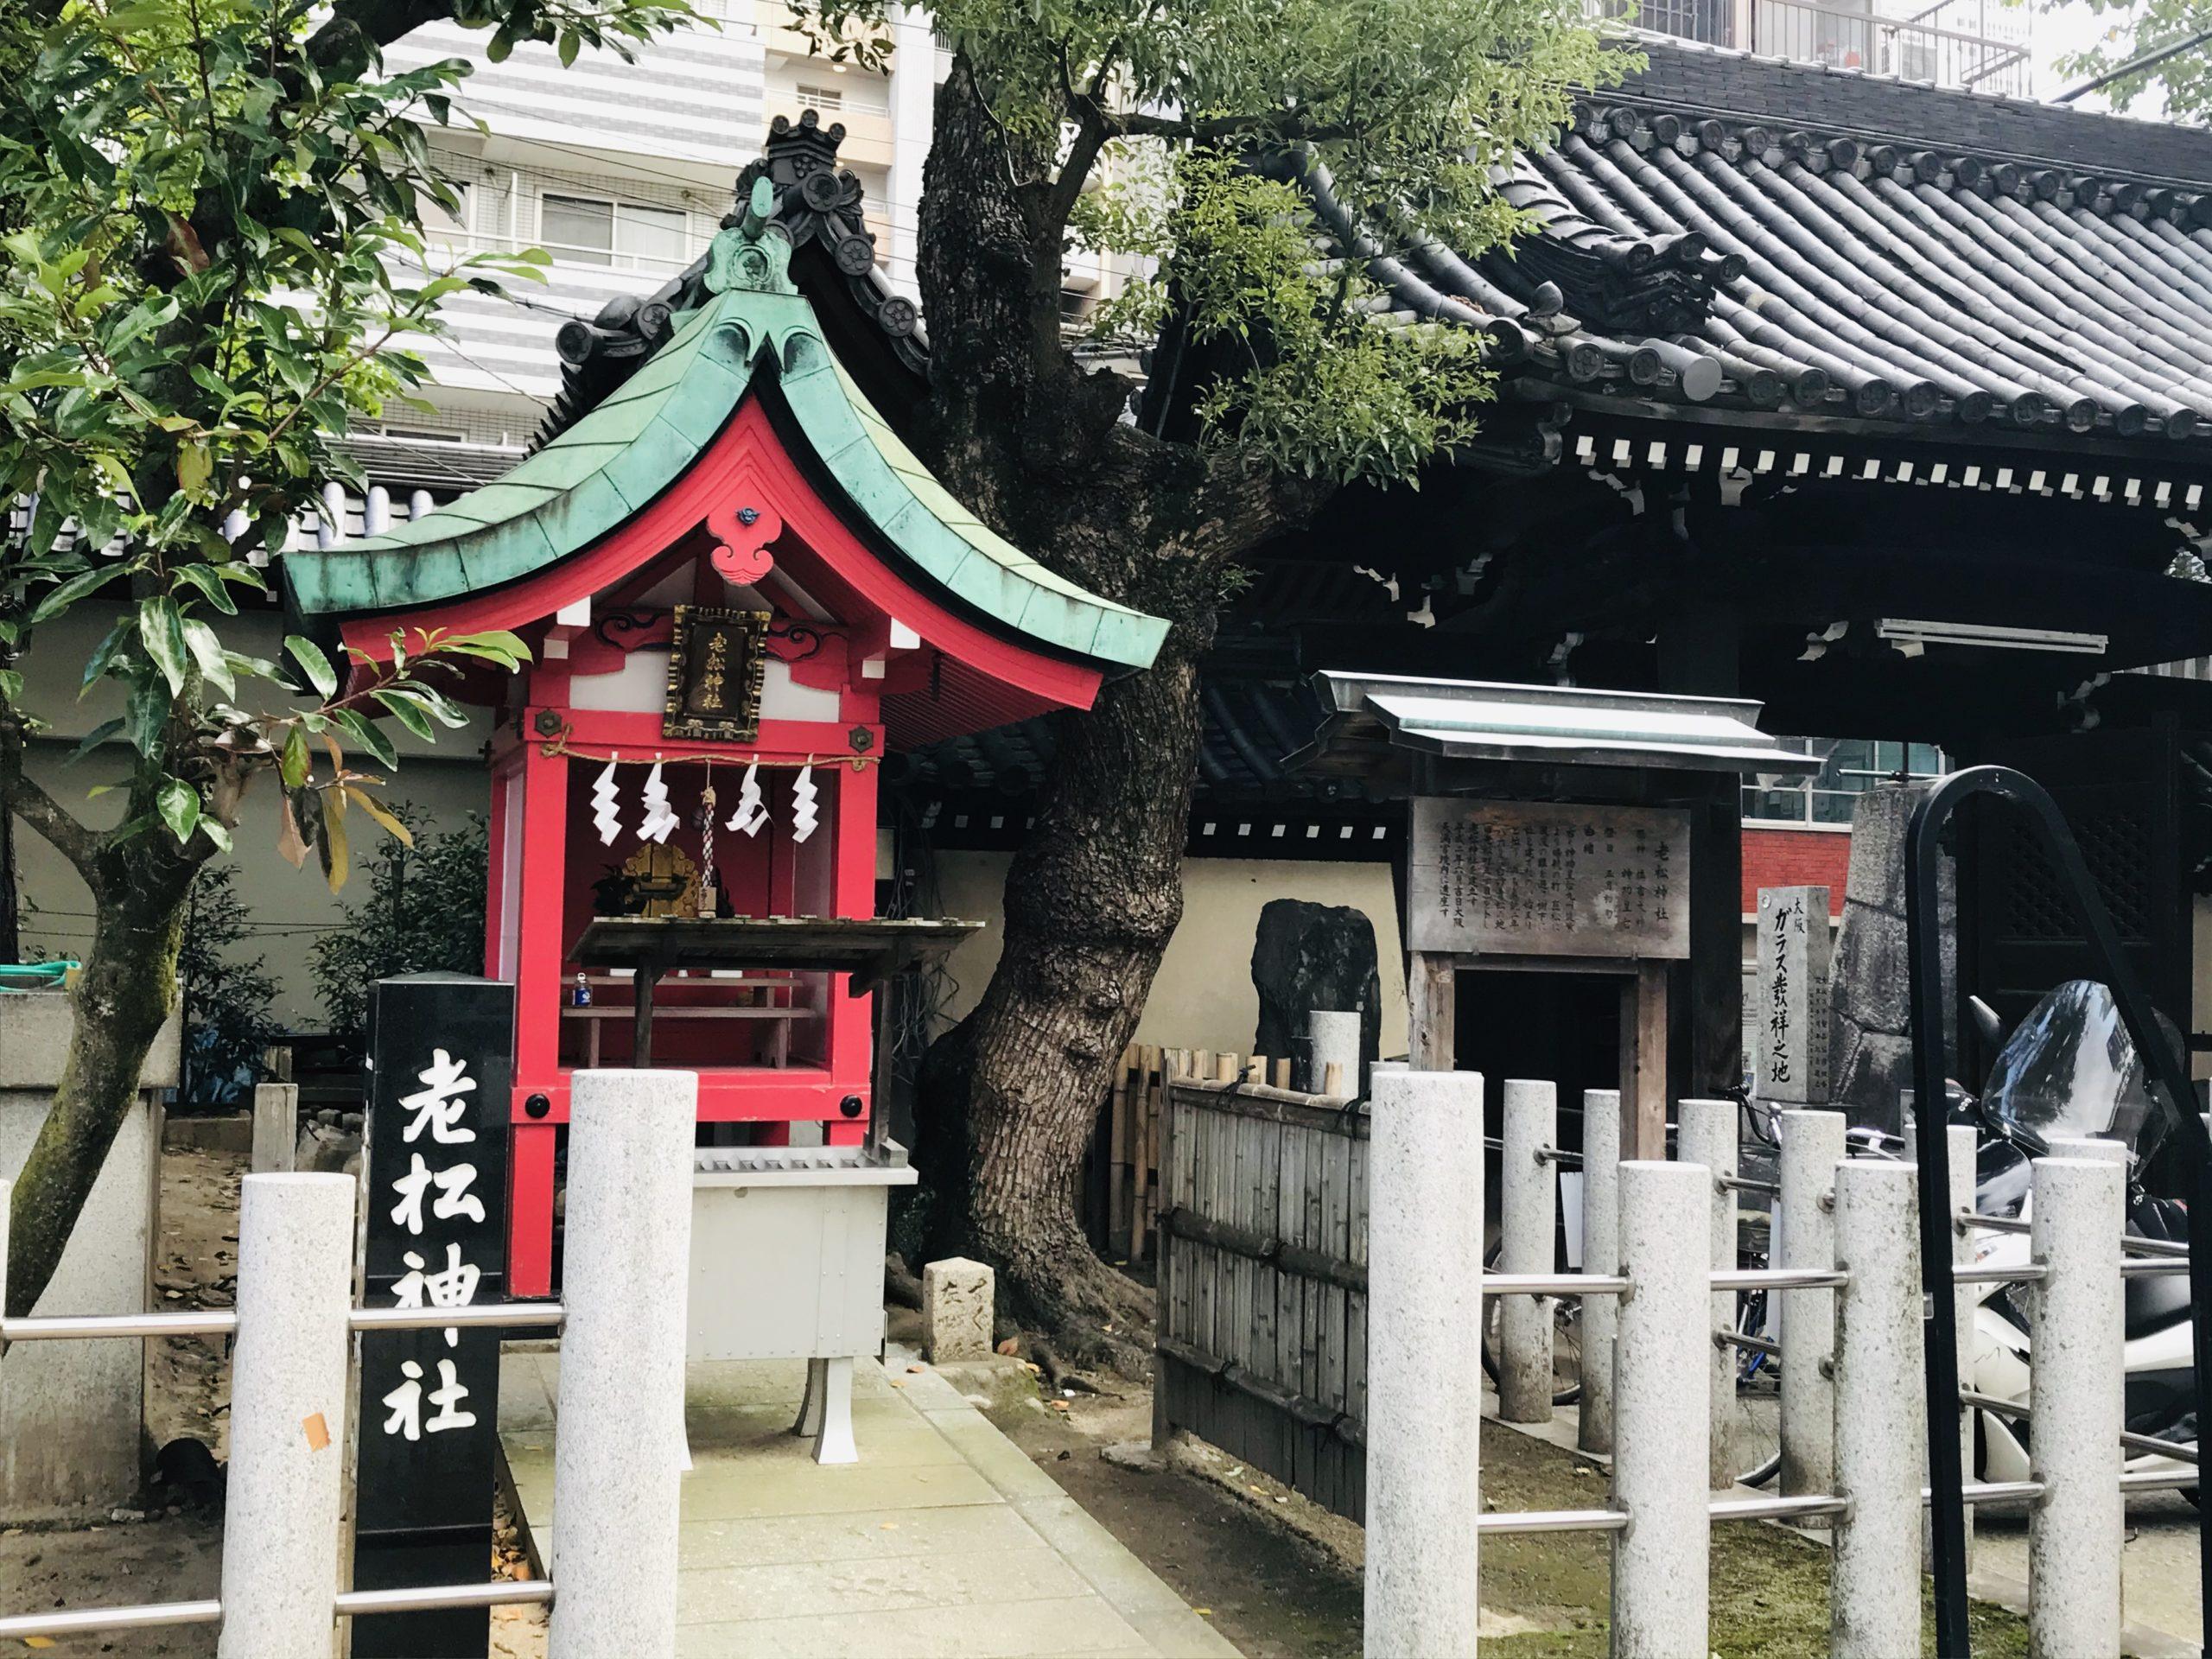 大阪天満宮の老松神社